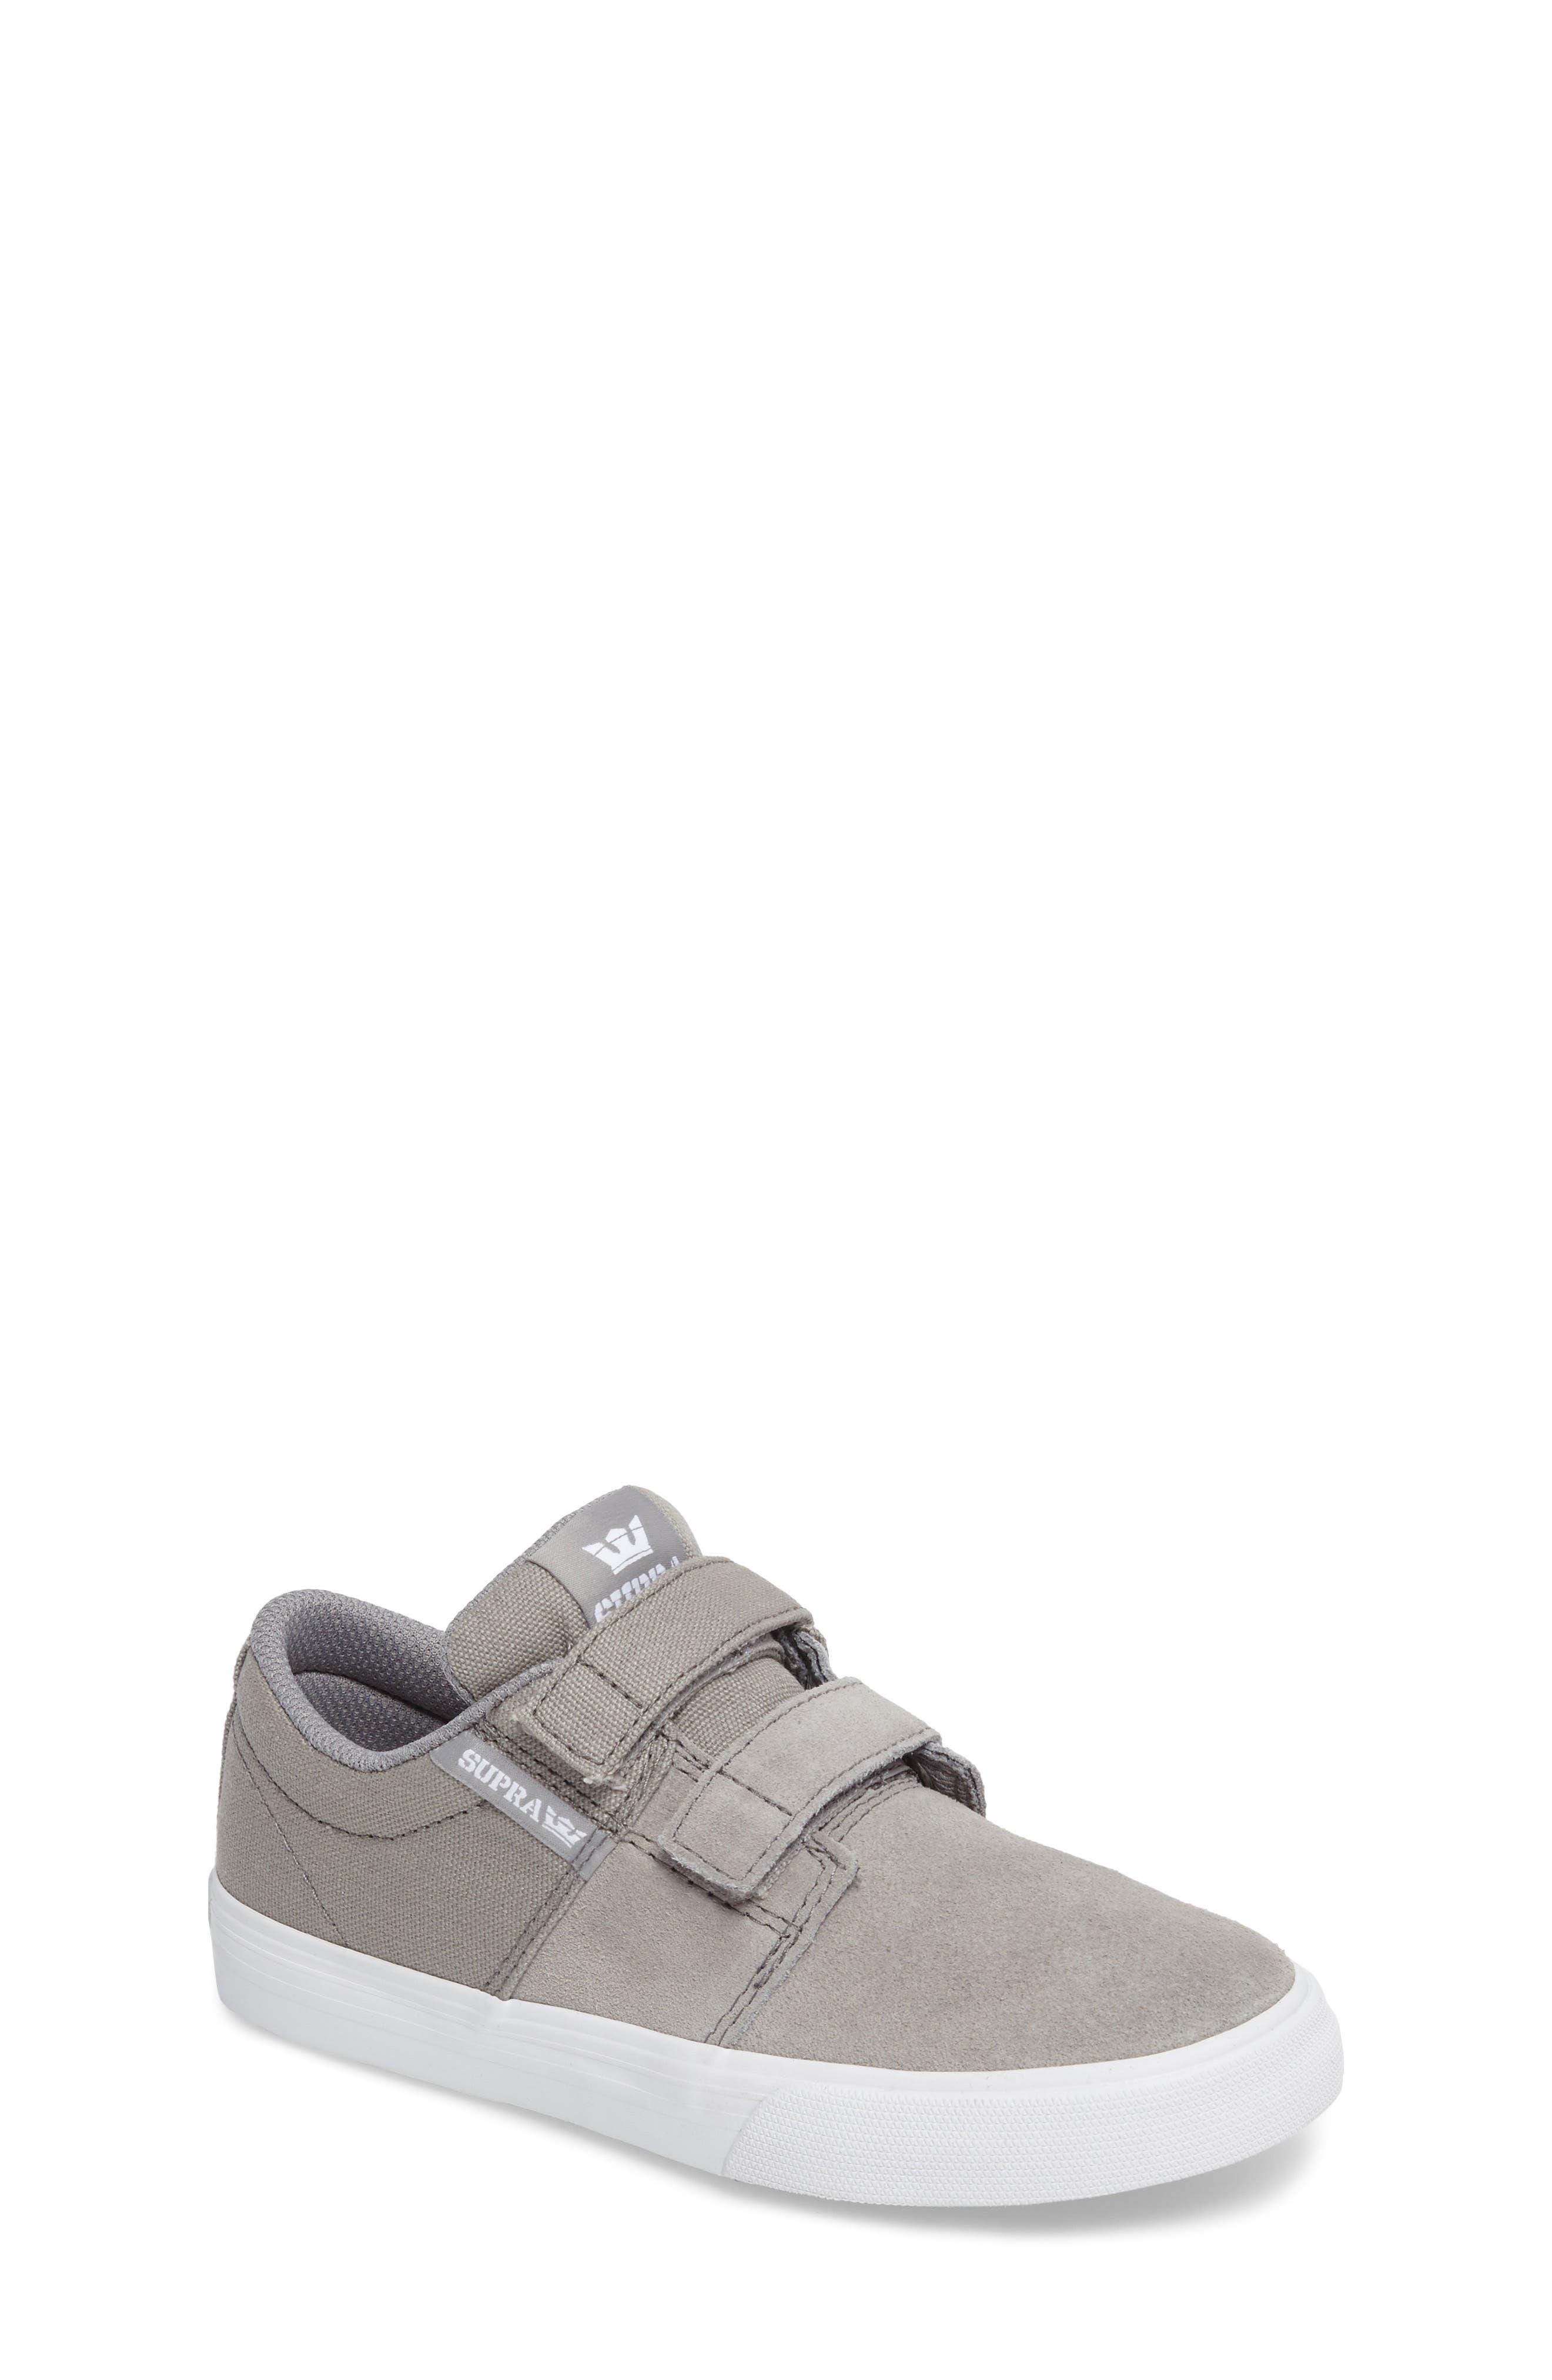 Main Image - Supra Stacks Low Top Sneaker (Toddler, Little Kid & Big Kid)